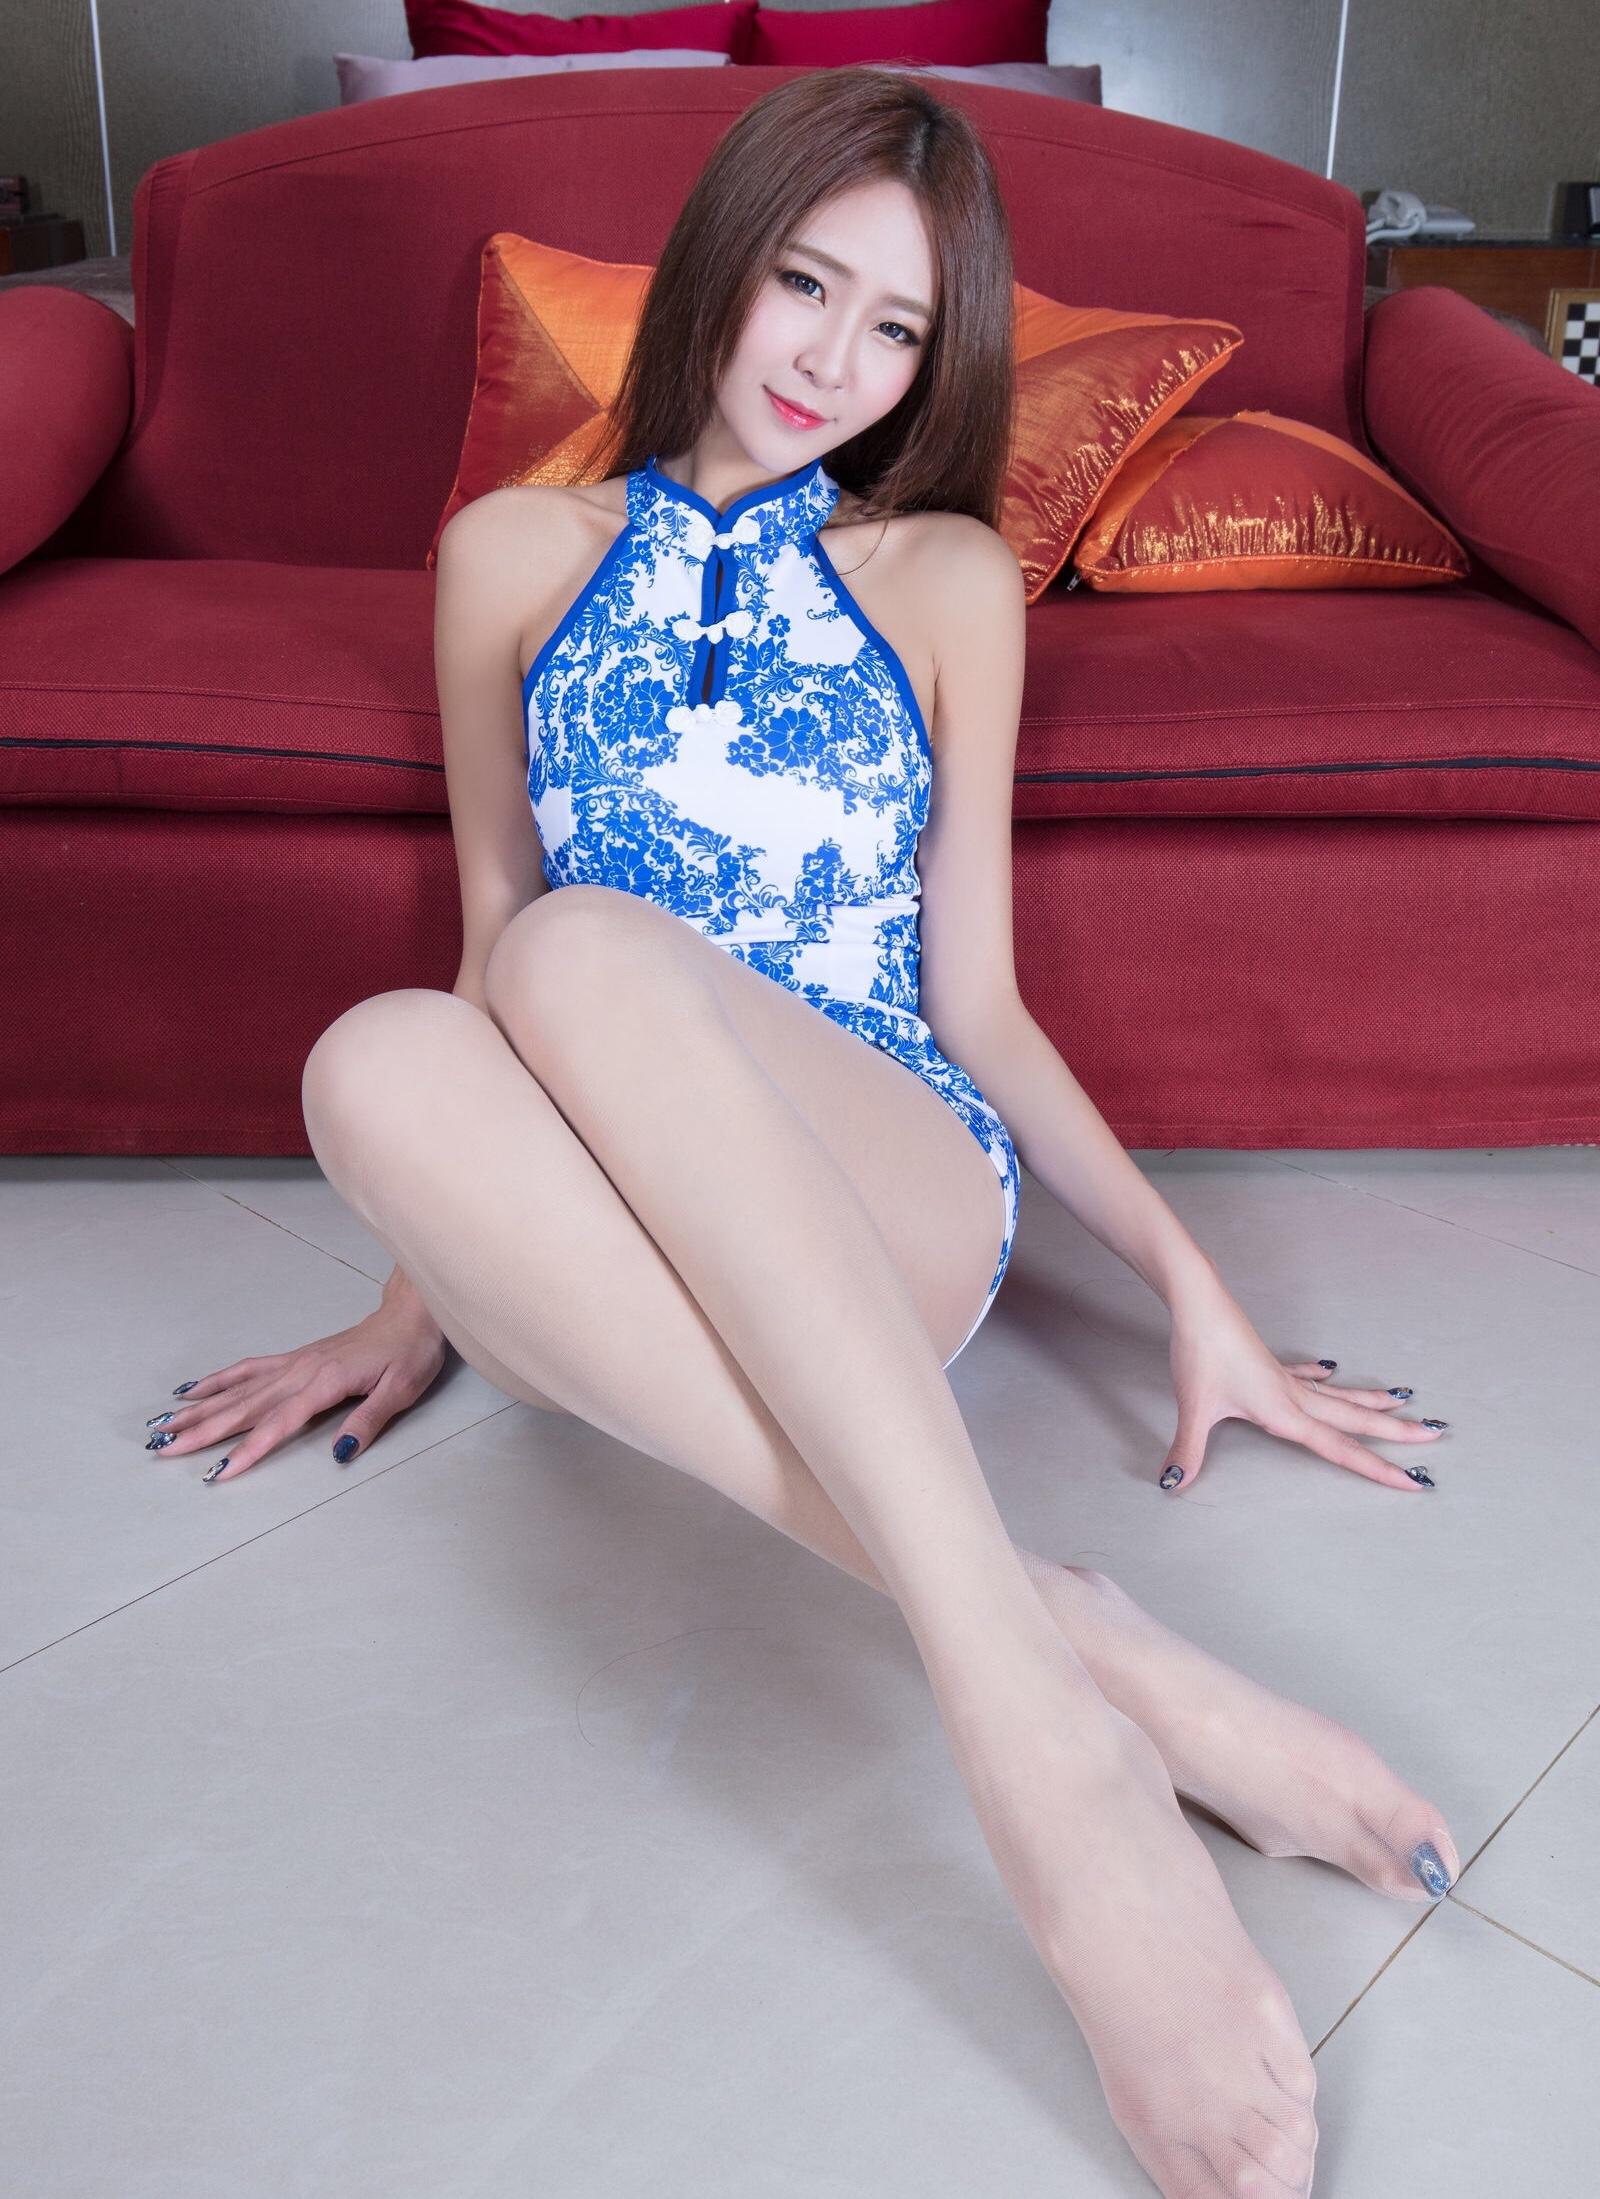 beautyleg winnie(青花瓷旗袍诱惑) 21